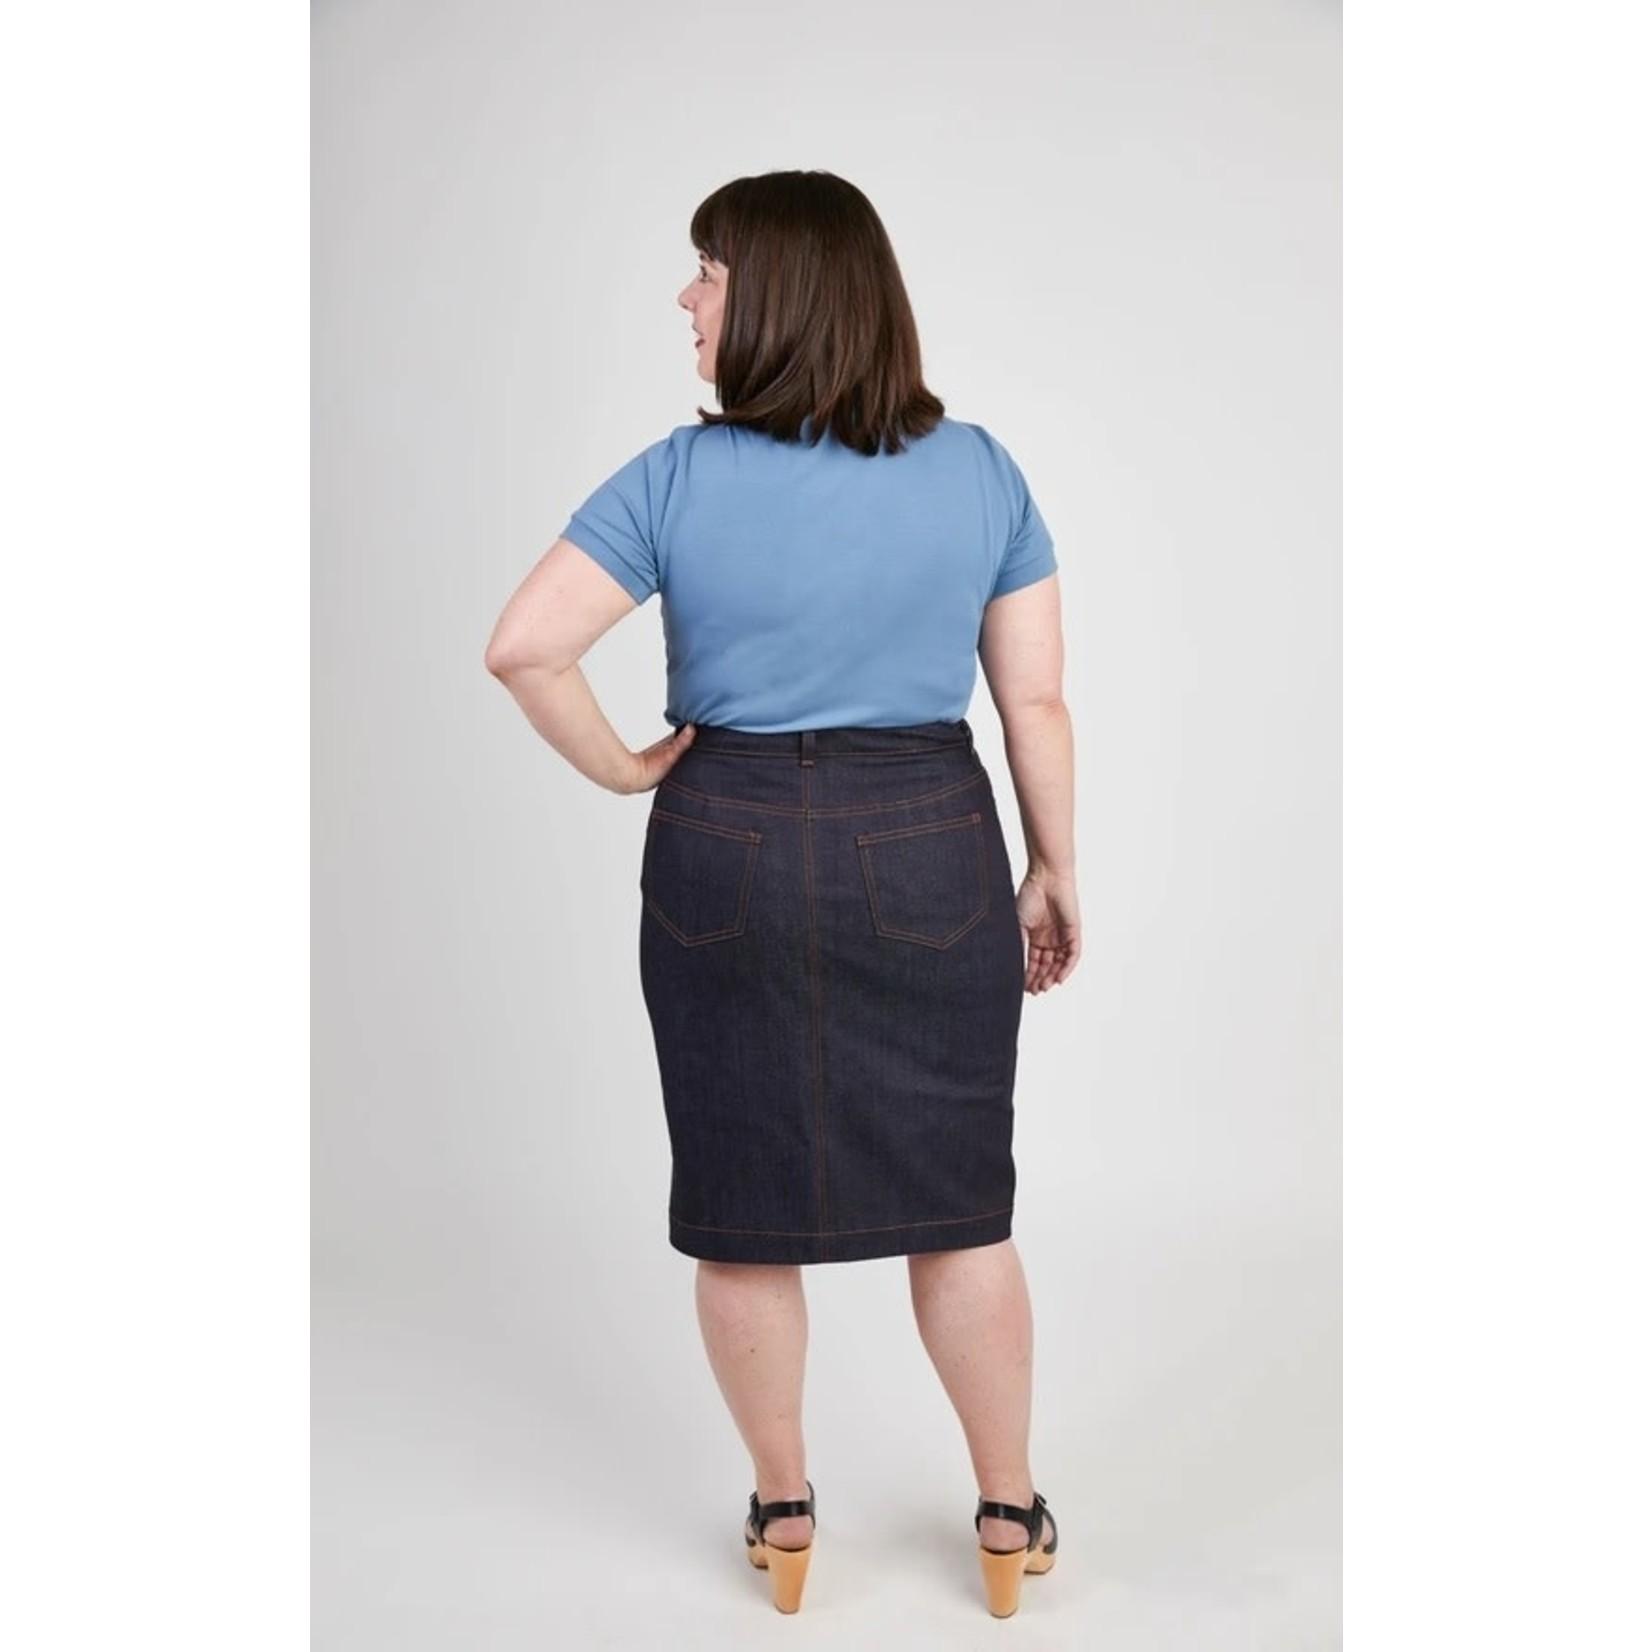 Cashmerette Ellis Skirt Pattern 12-28 (Apple & Pear Fit)